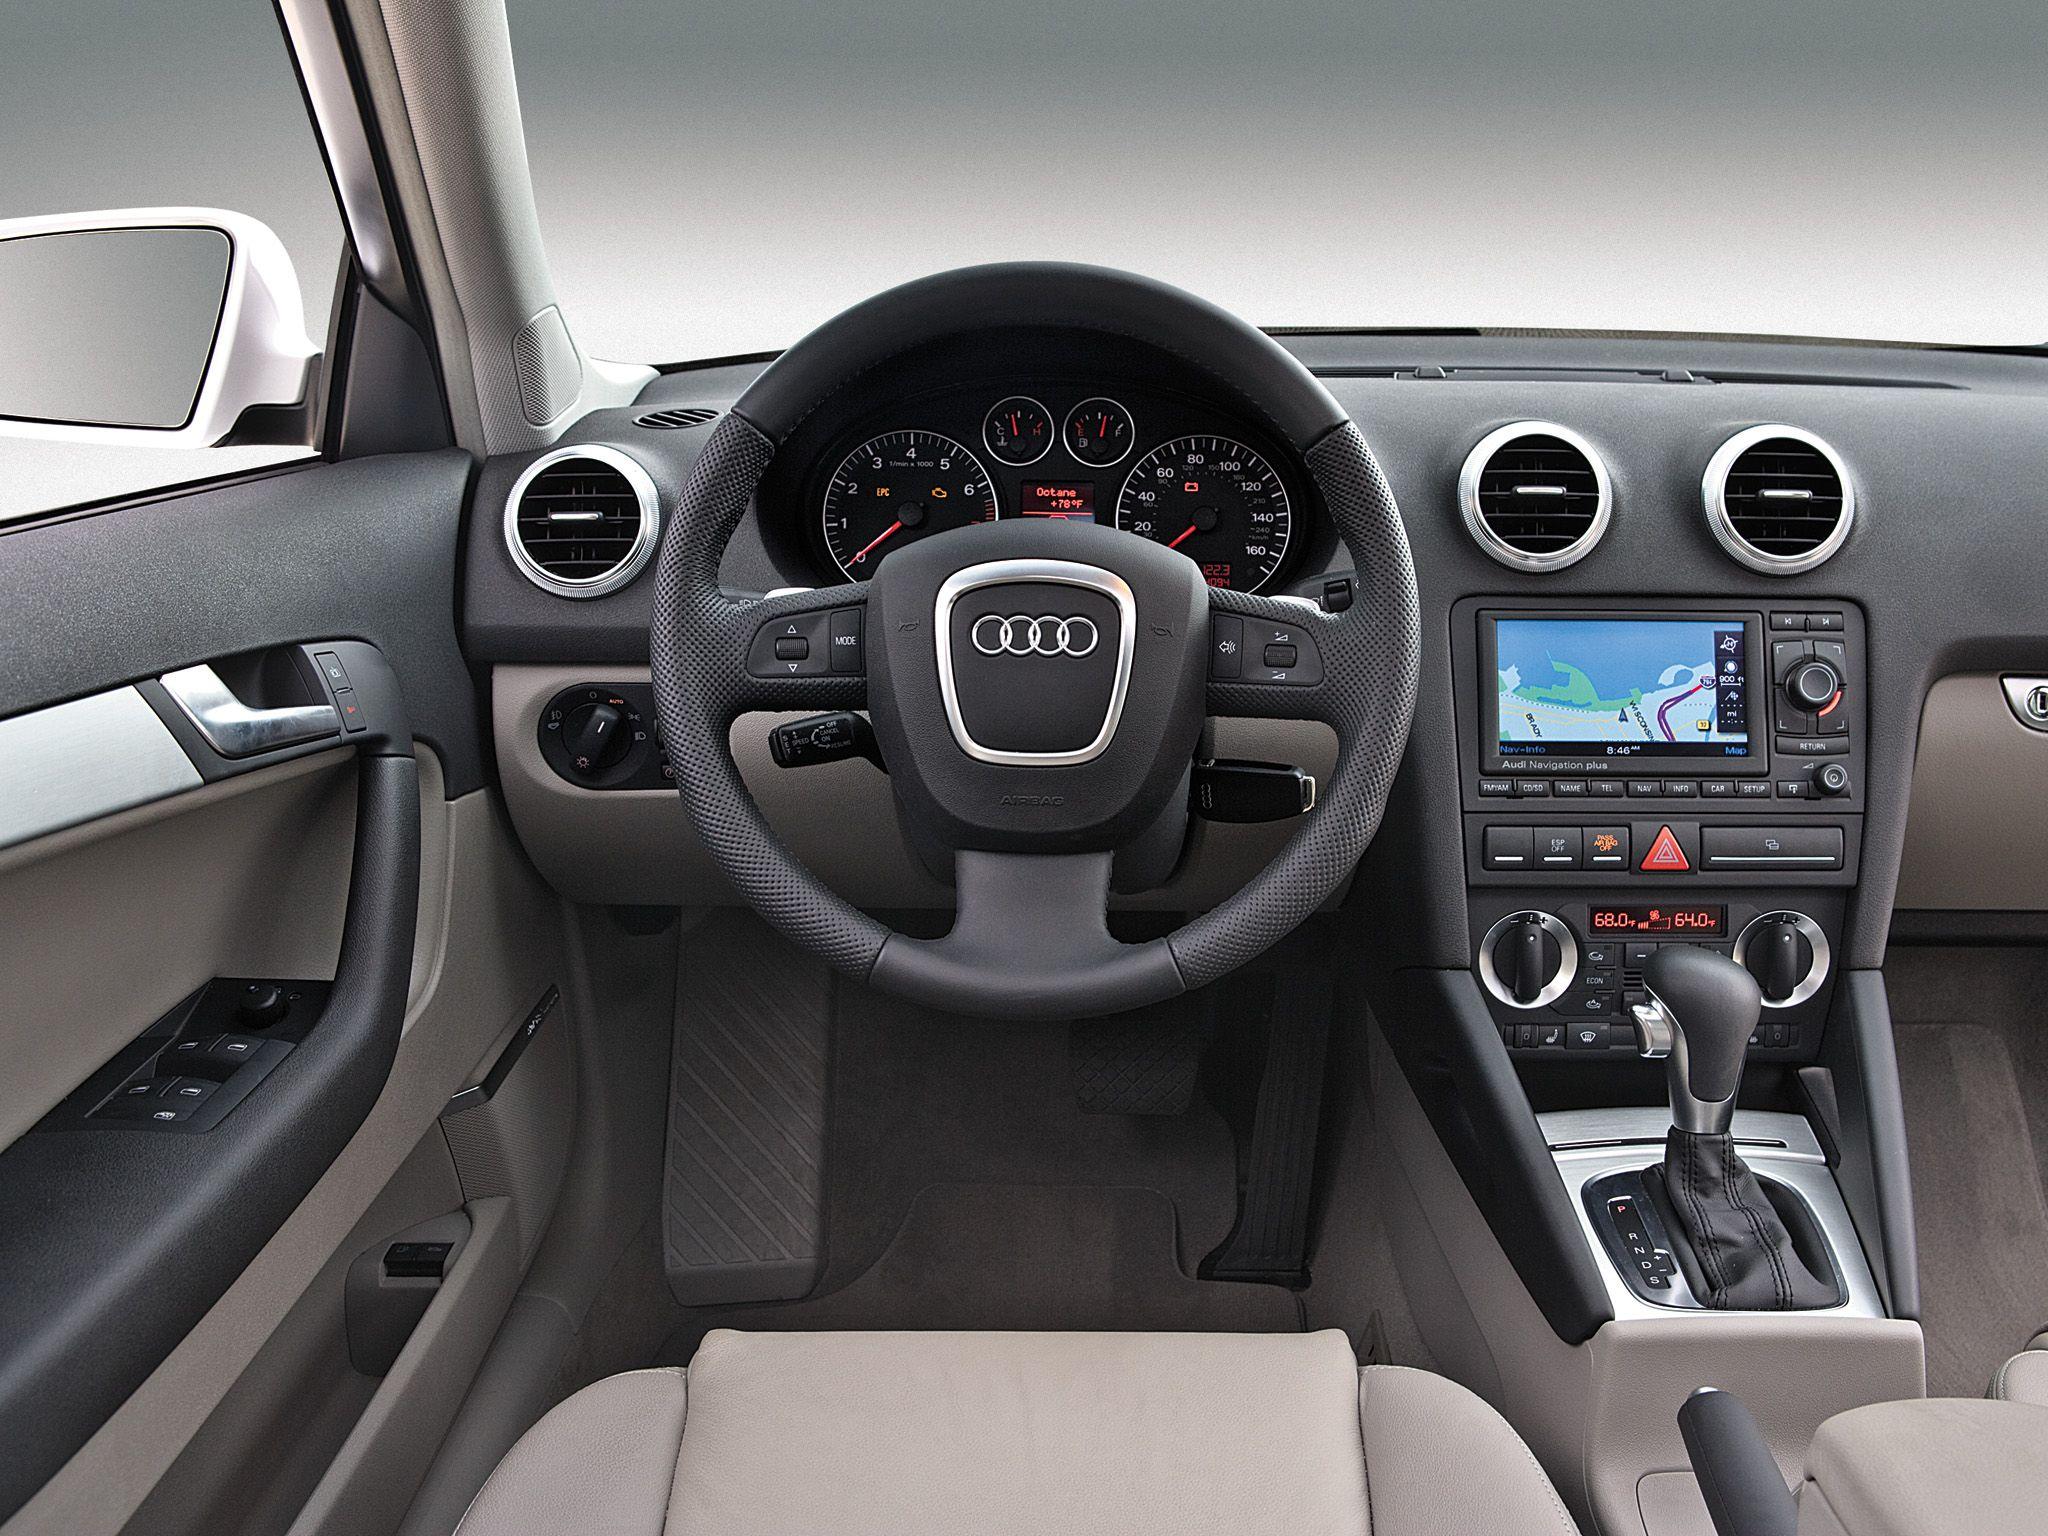 200508 Audi A3 Sportback 3.2 SLine North America (8PA